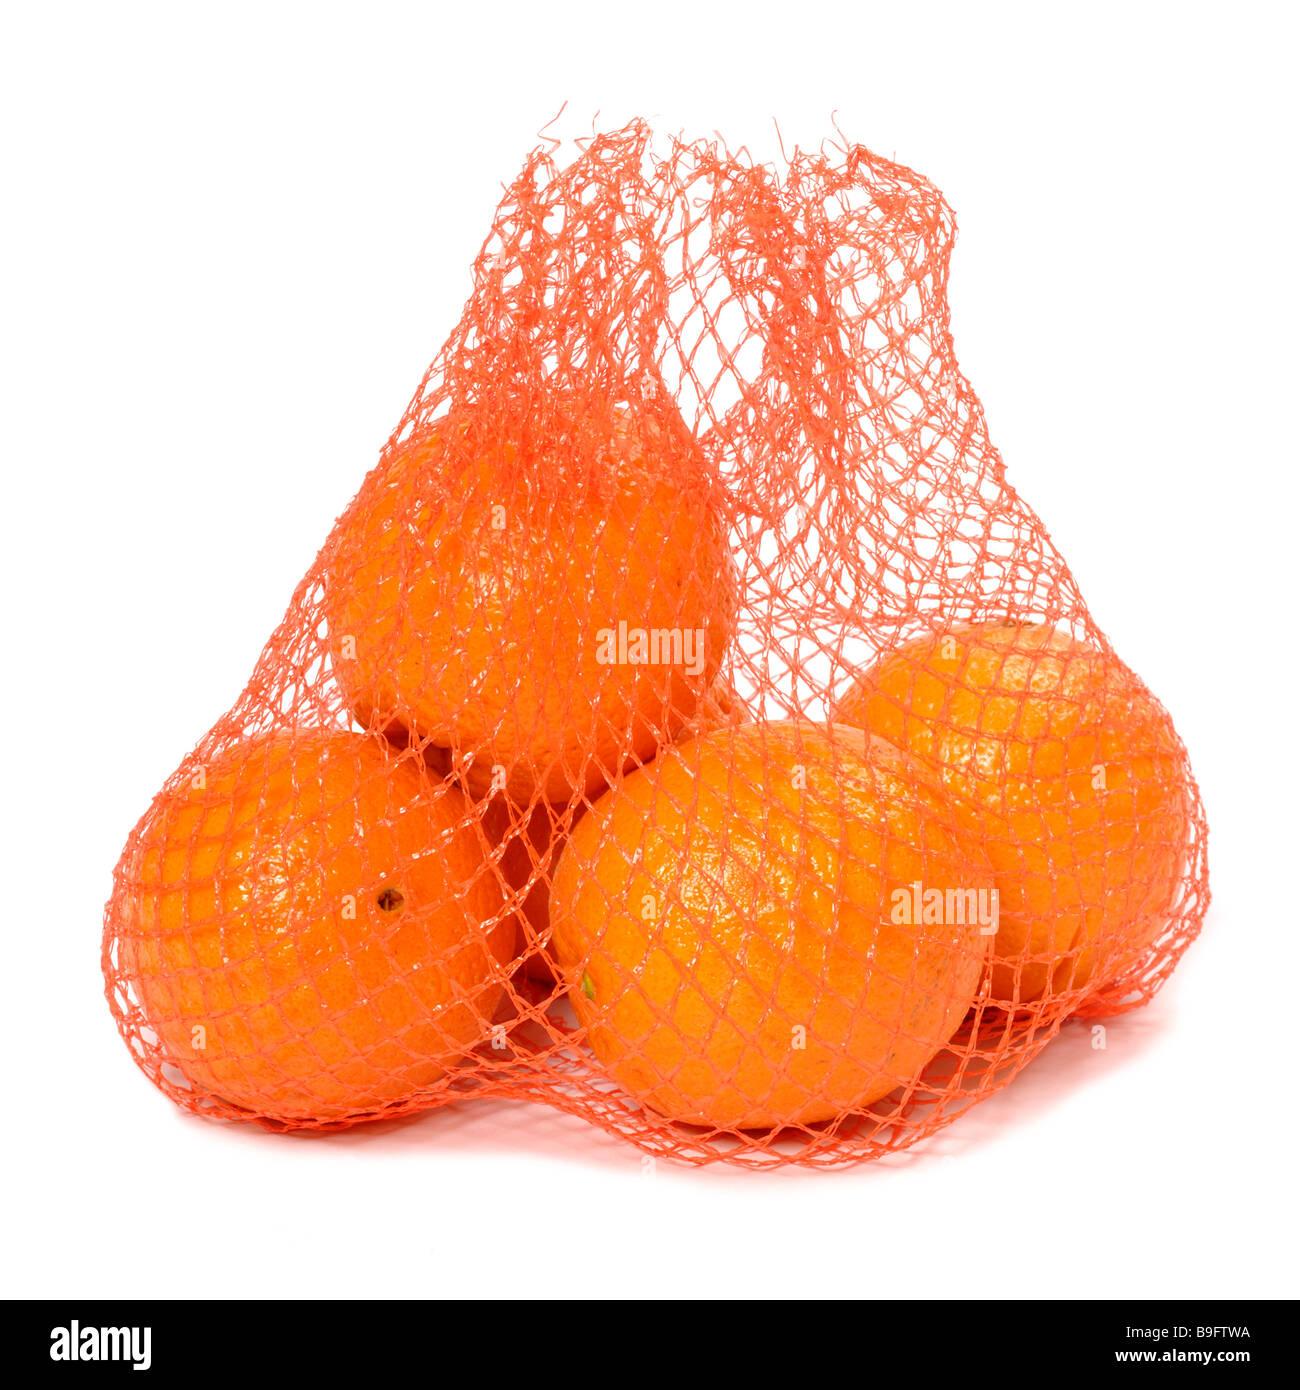 Sac d'oranges Photo Stock